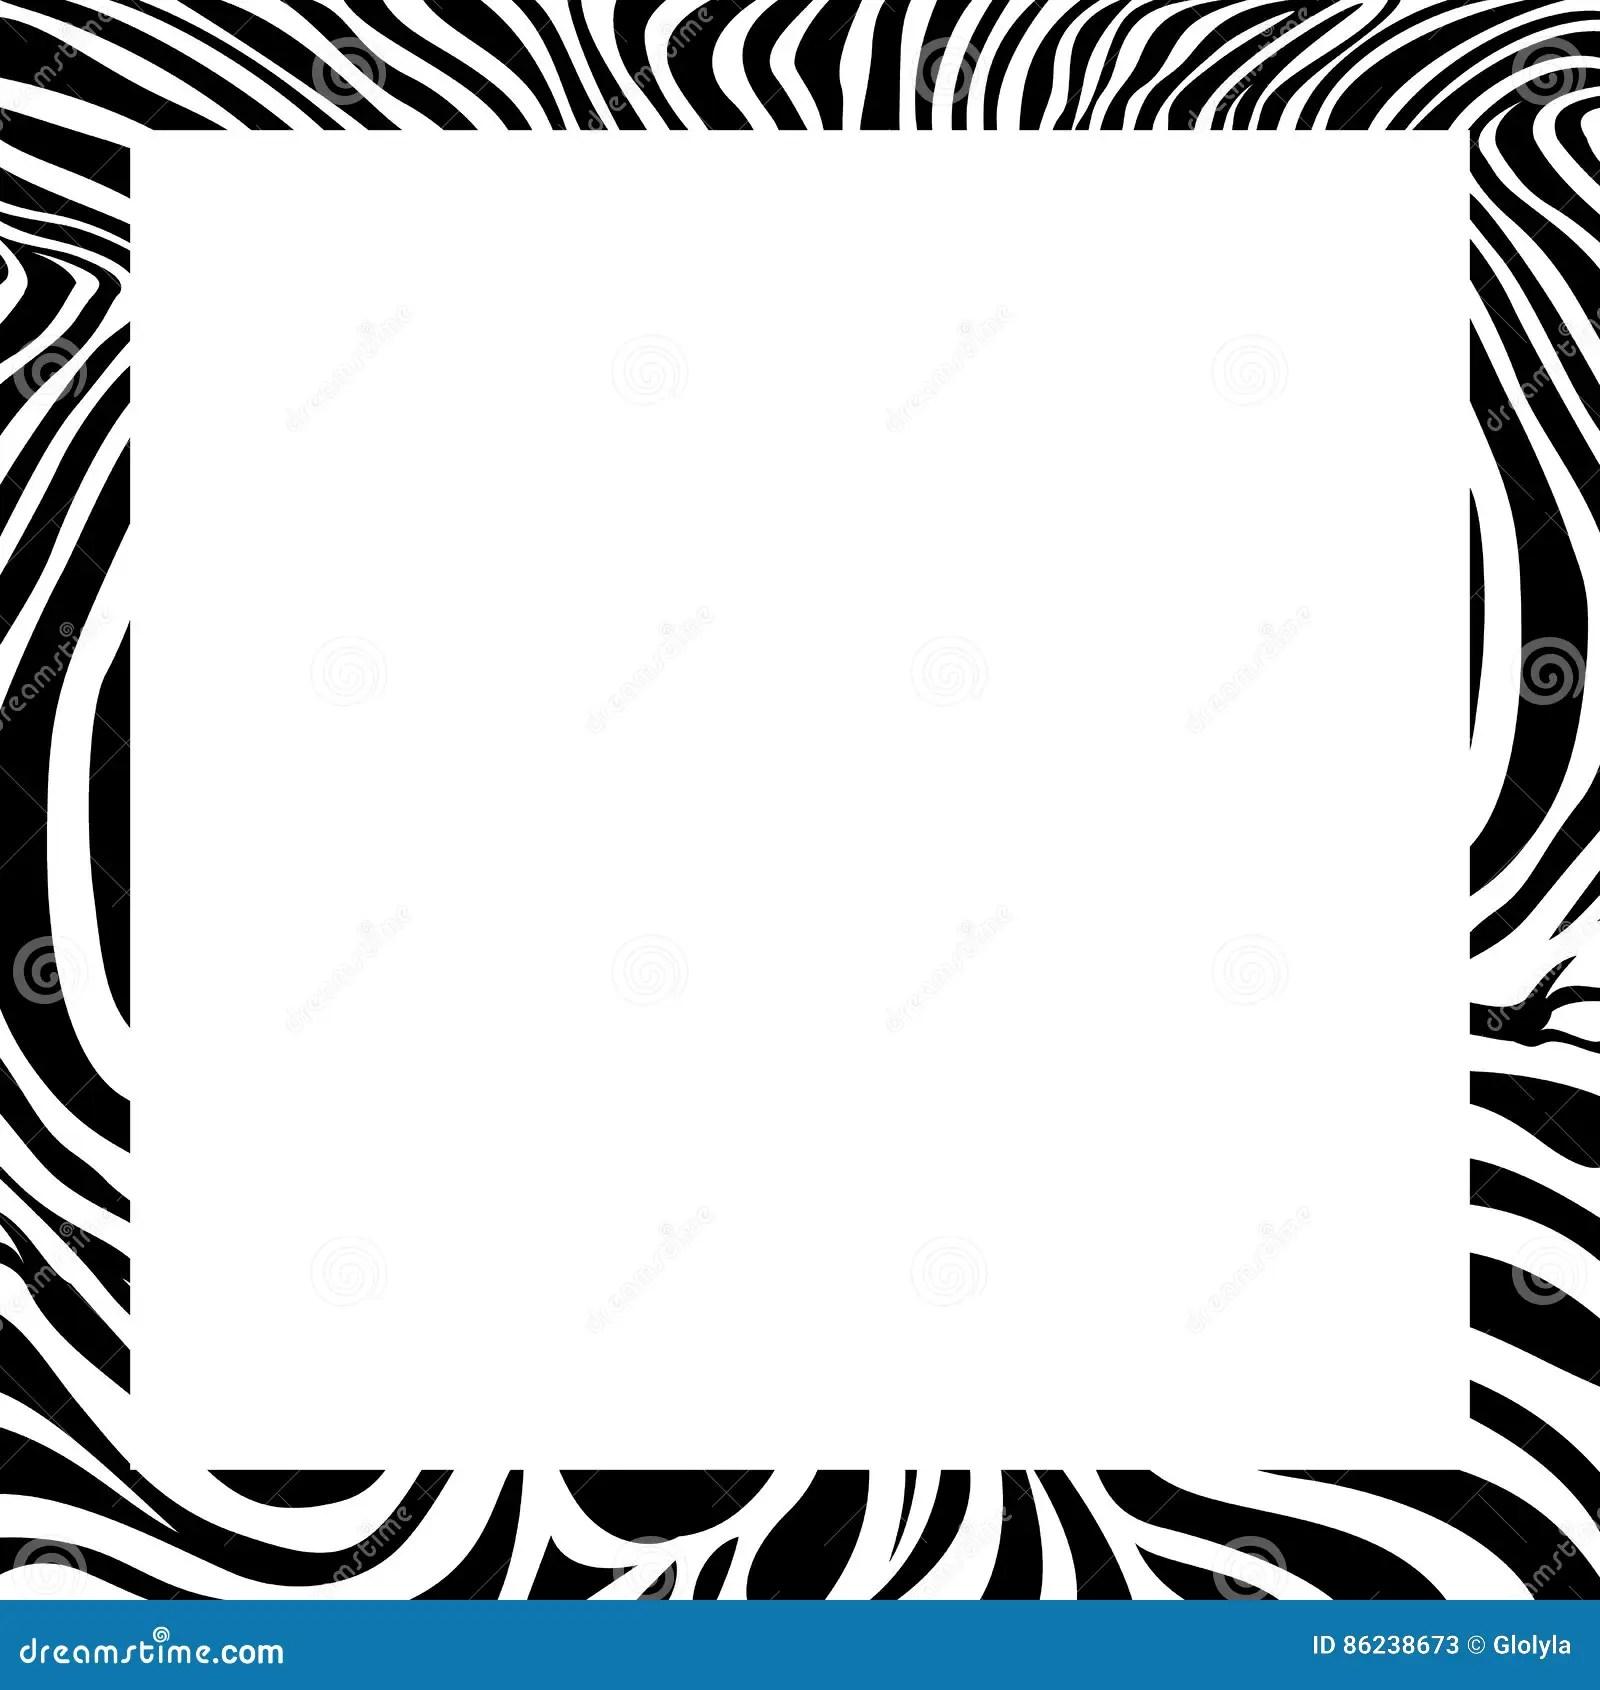 Zebra Print Border Frame Design Stock Vector